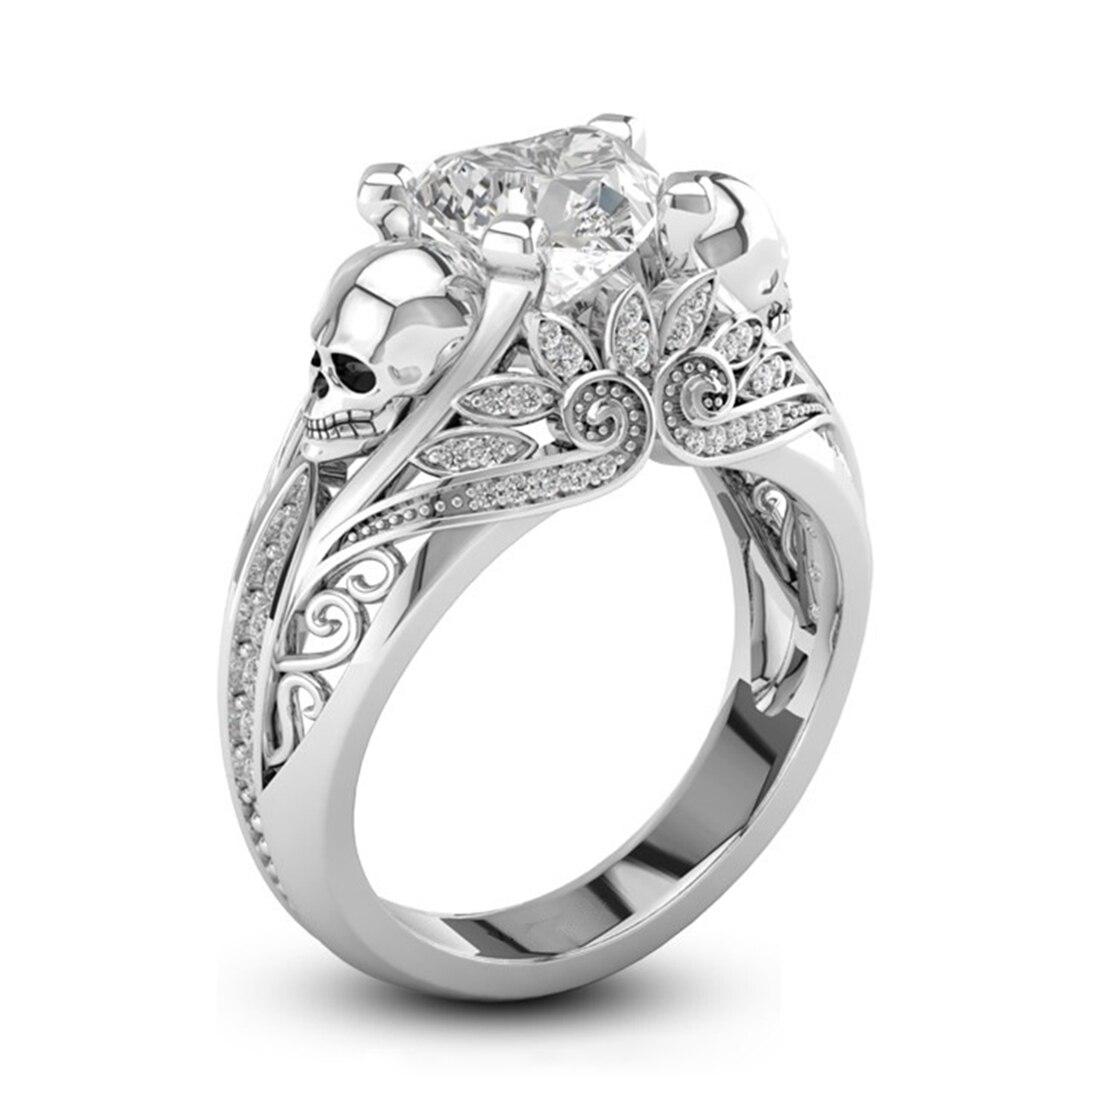 Heart Shape CZ Stone Silver Punk Skull Promise Ring For